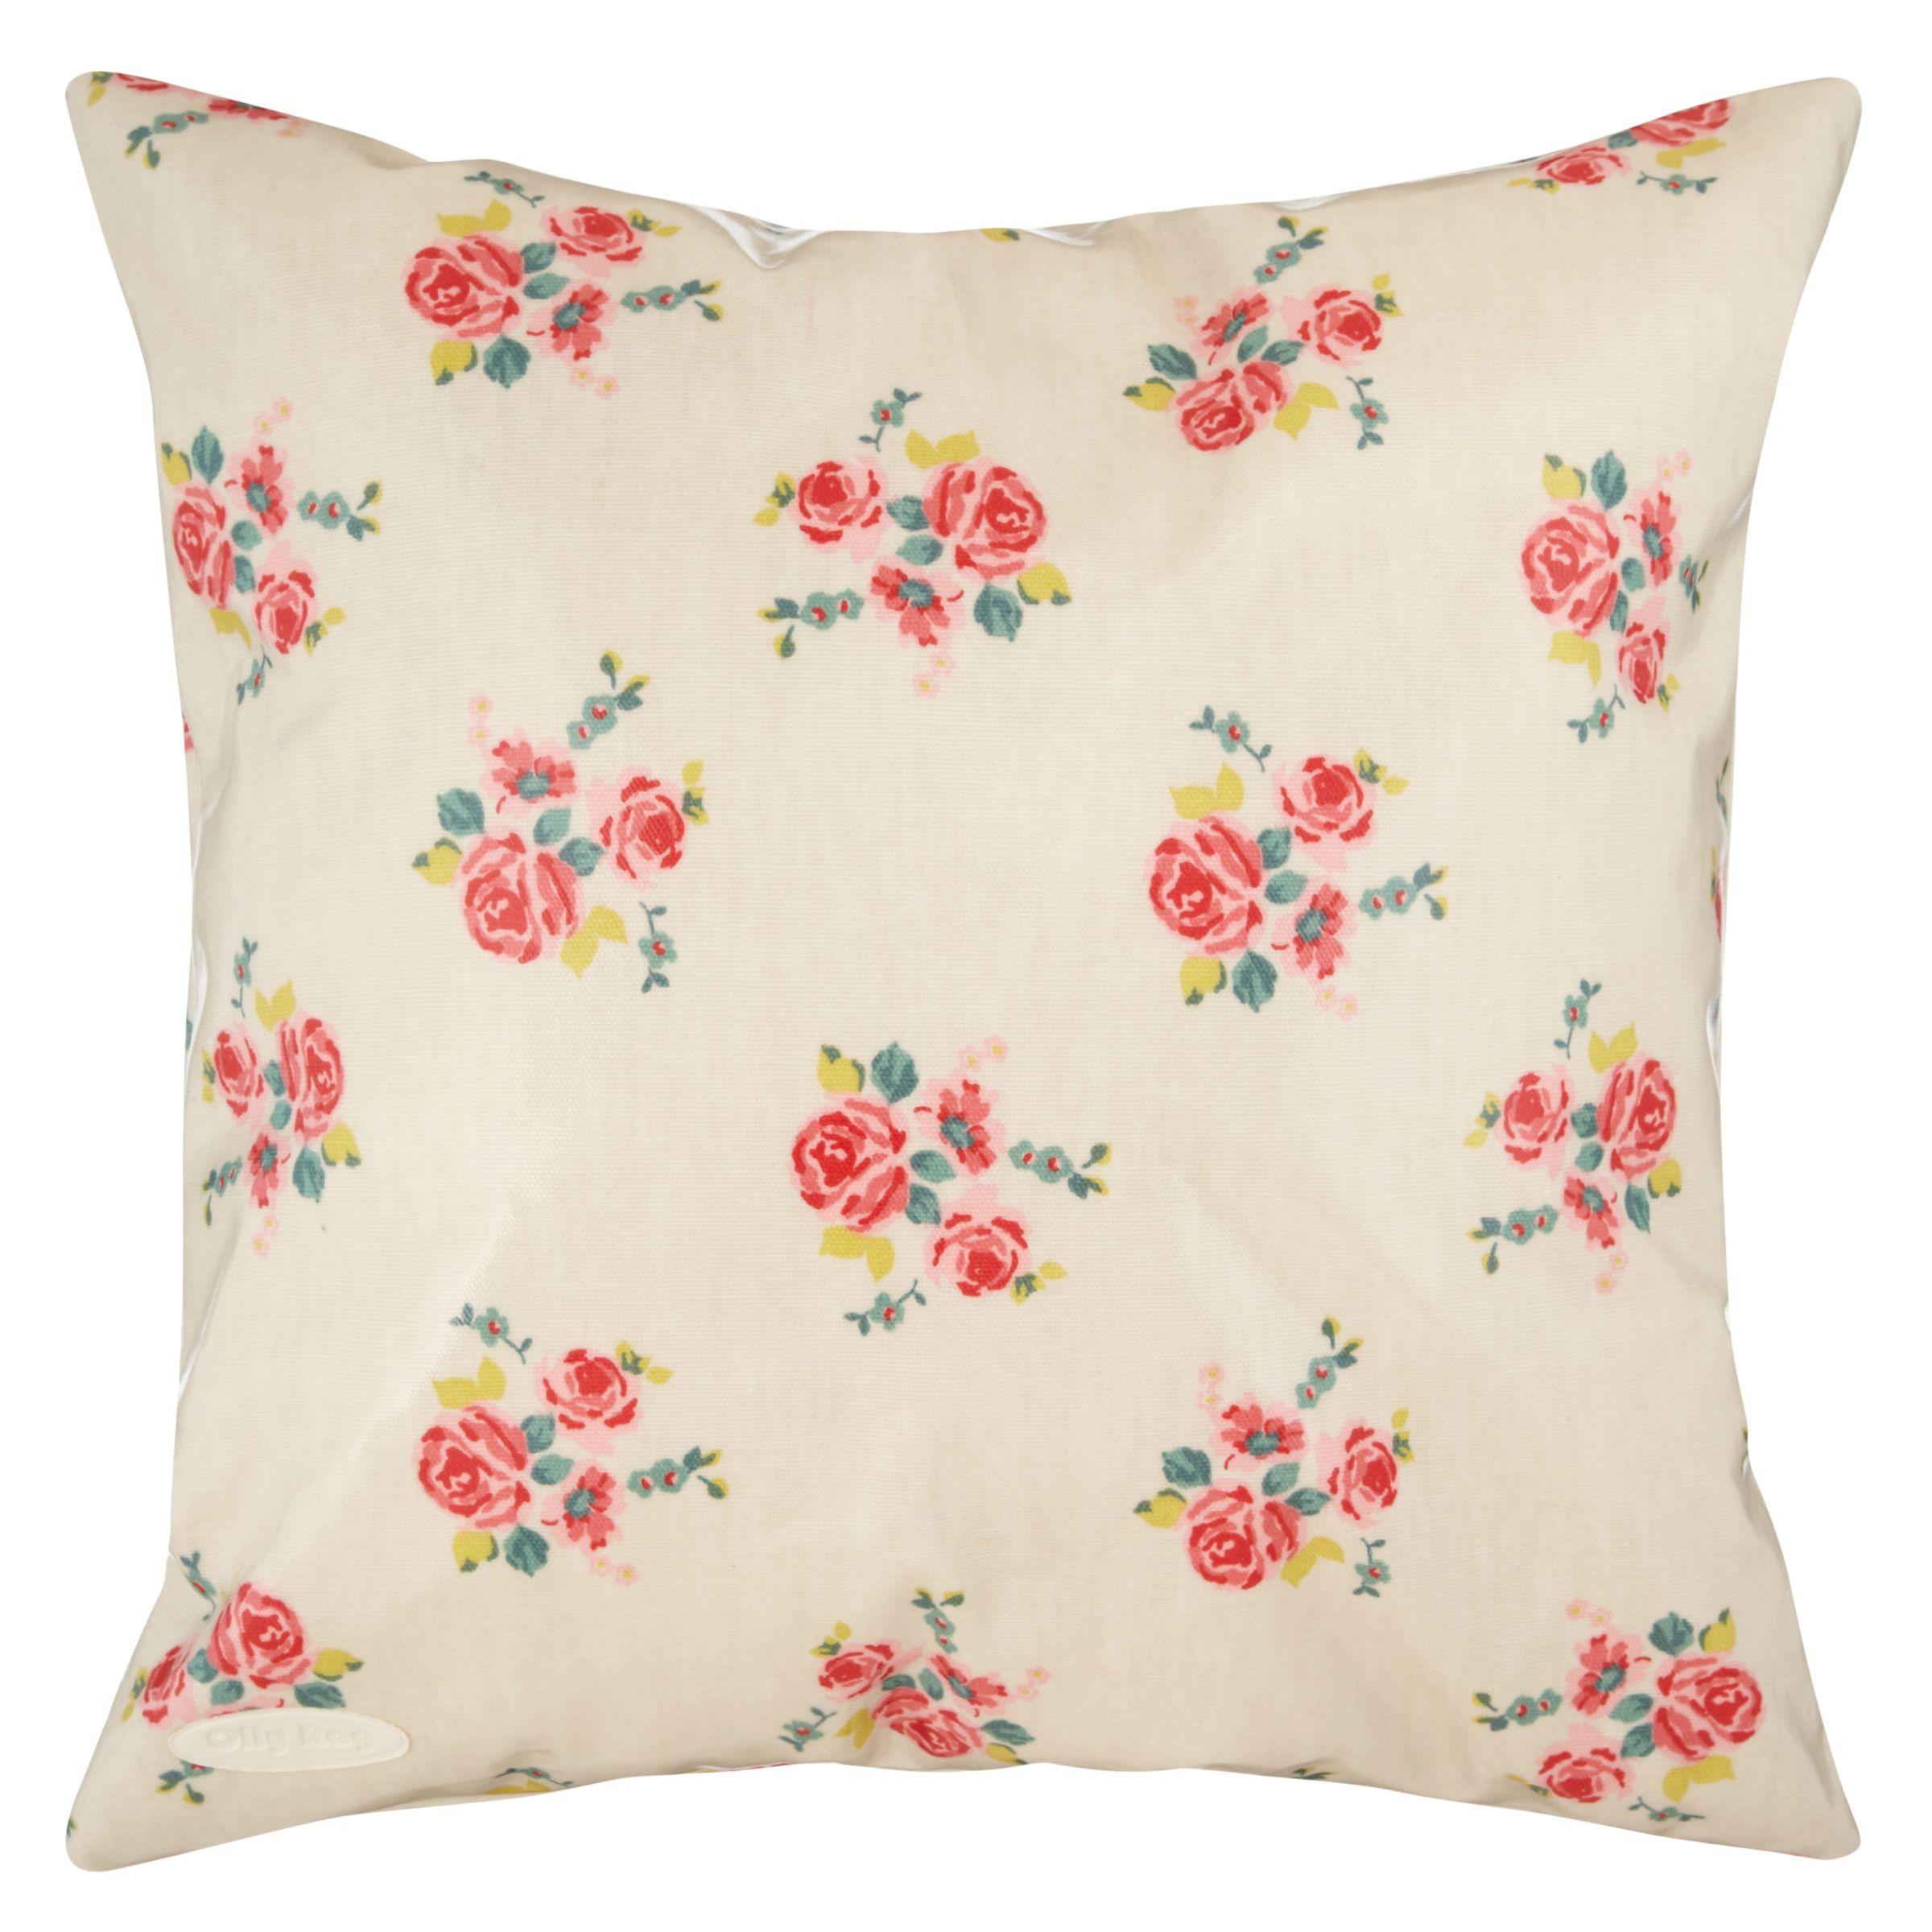 Oily Rag Vintage Floral Outdoor Cushion, 40 x 40cm